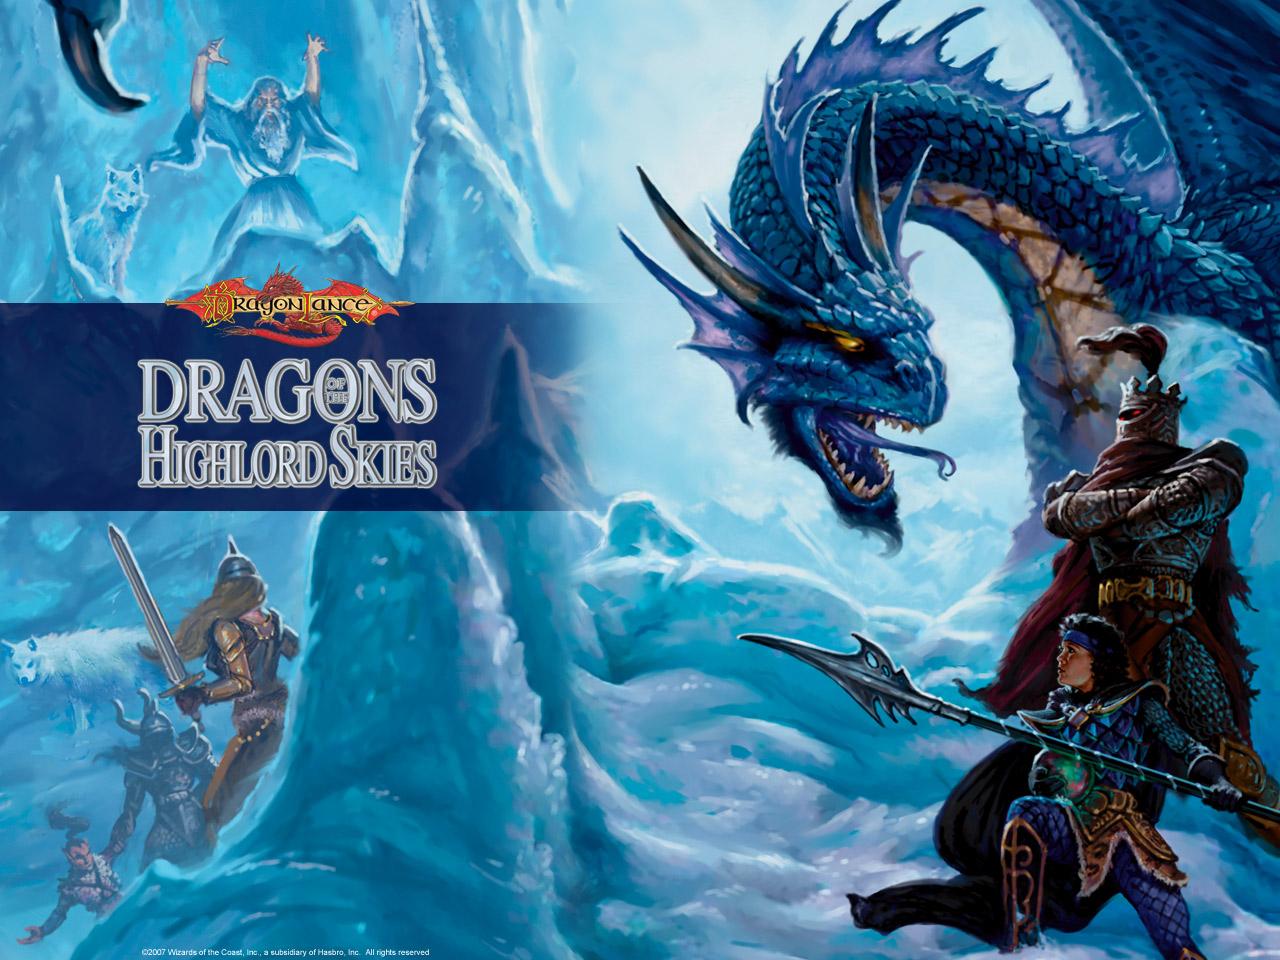 http://www.dragonlance.ru/uploads/base/base_gallery/18_1.jpg